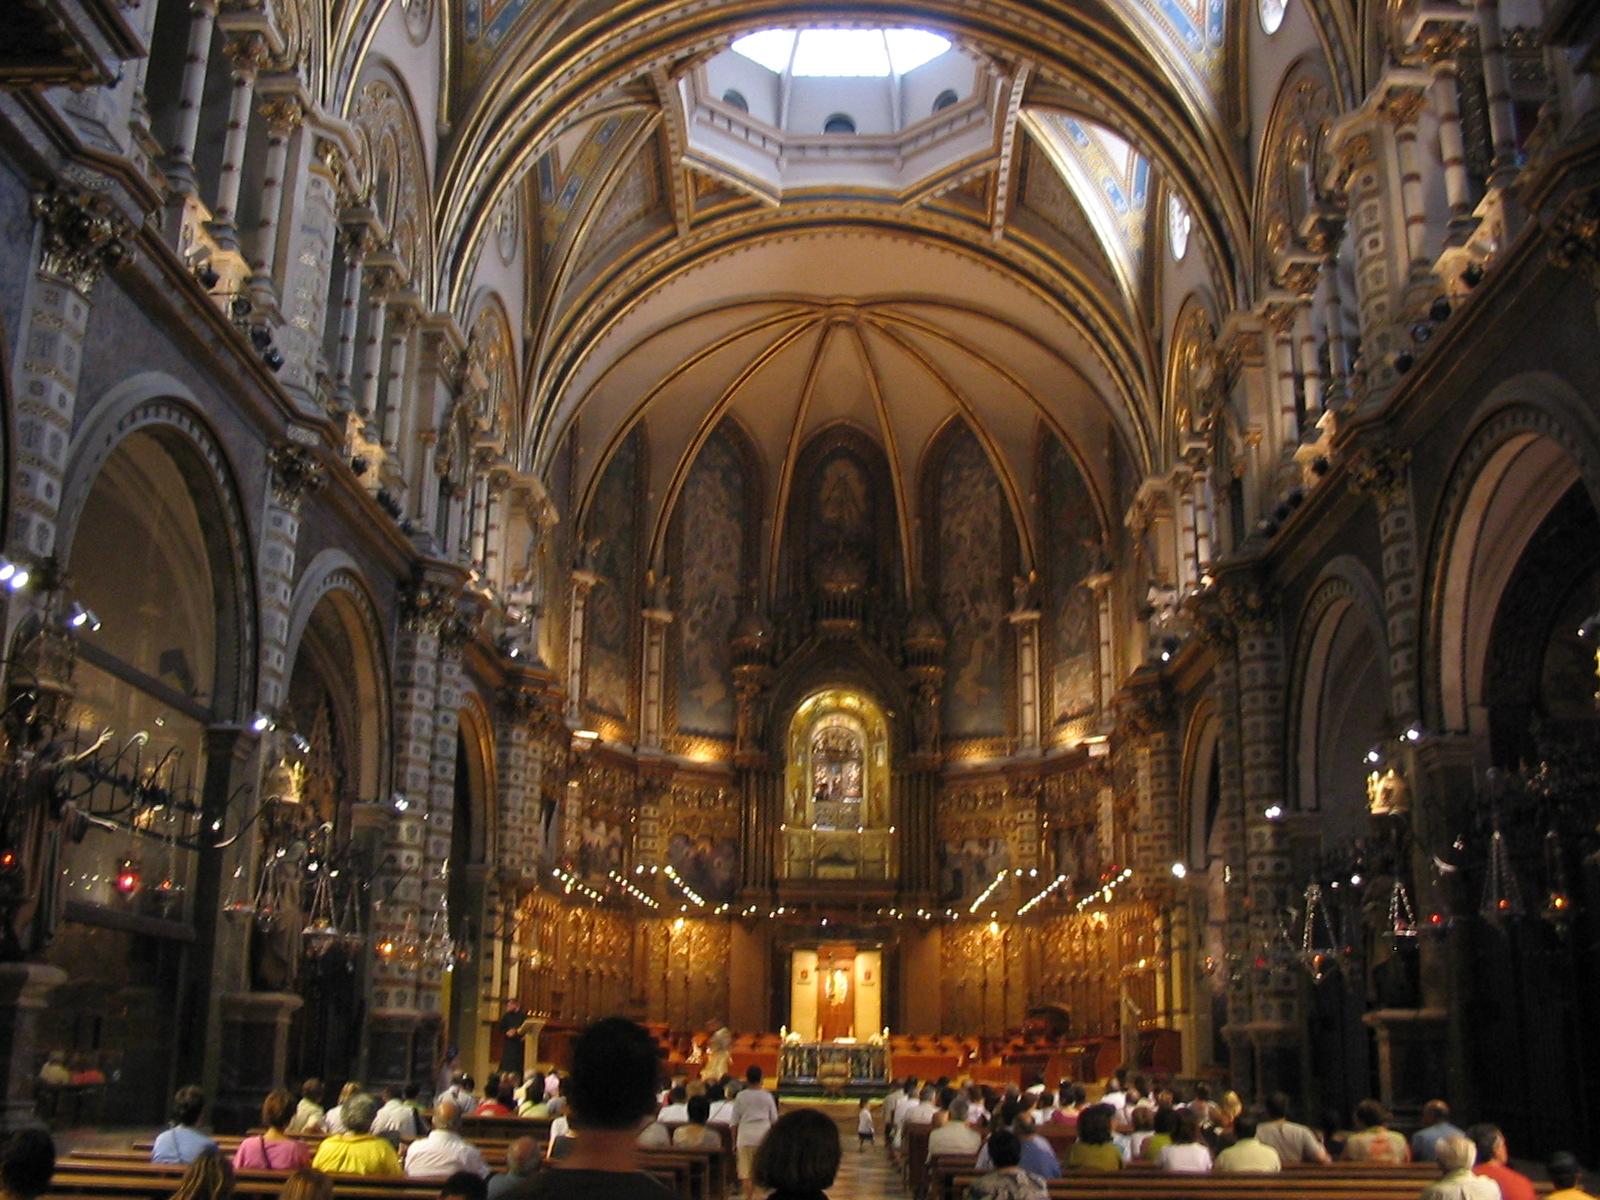 File:Monestir de Montserrat 2006 - 06.JPG - Wikimedia Commons